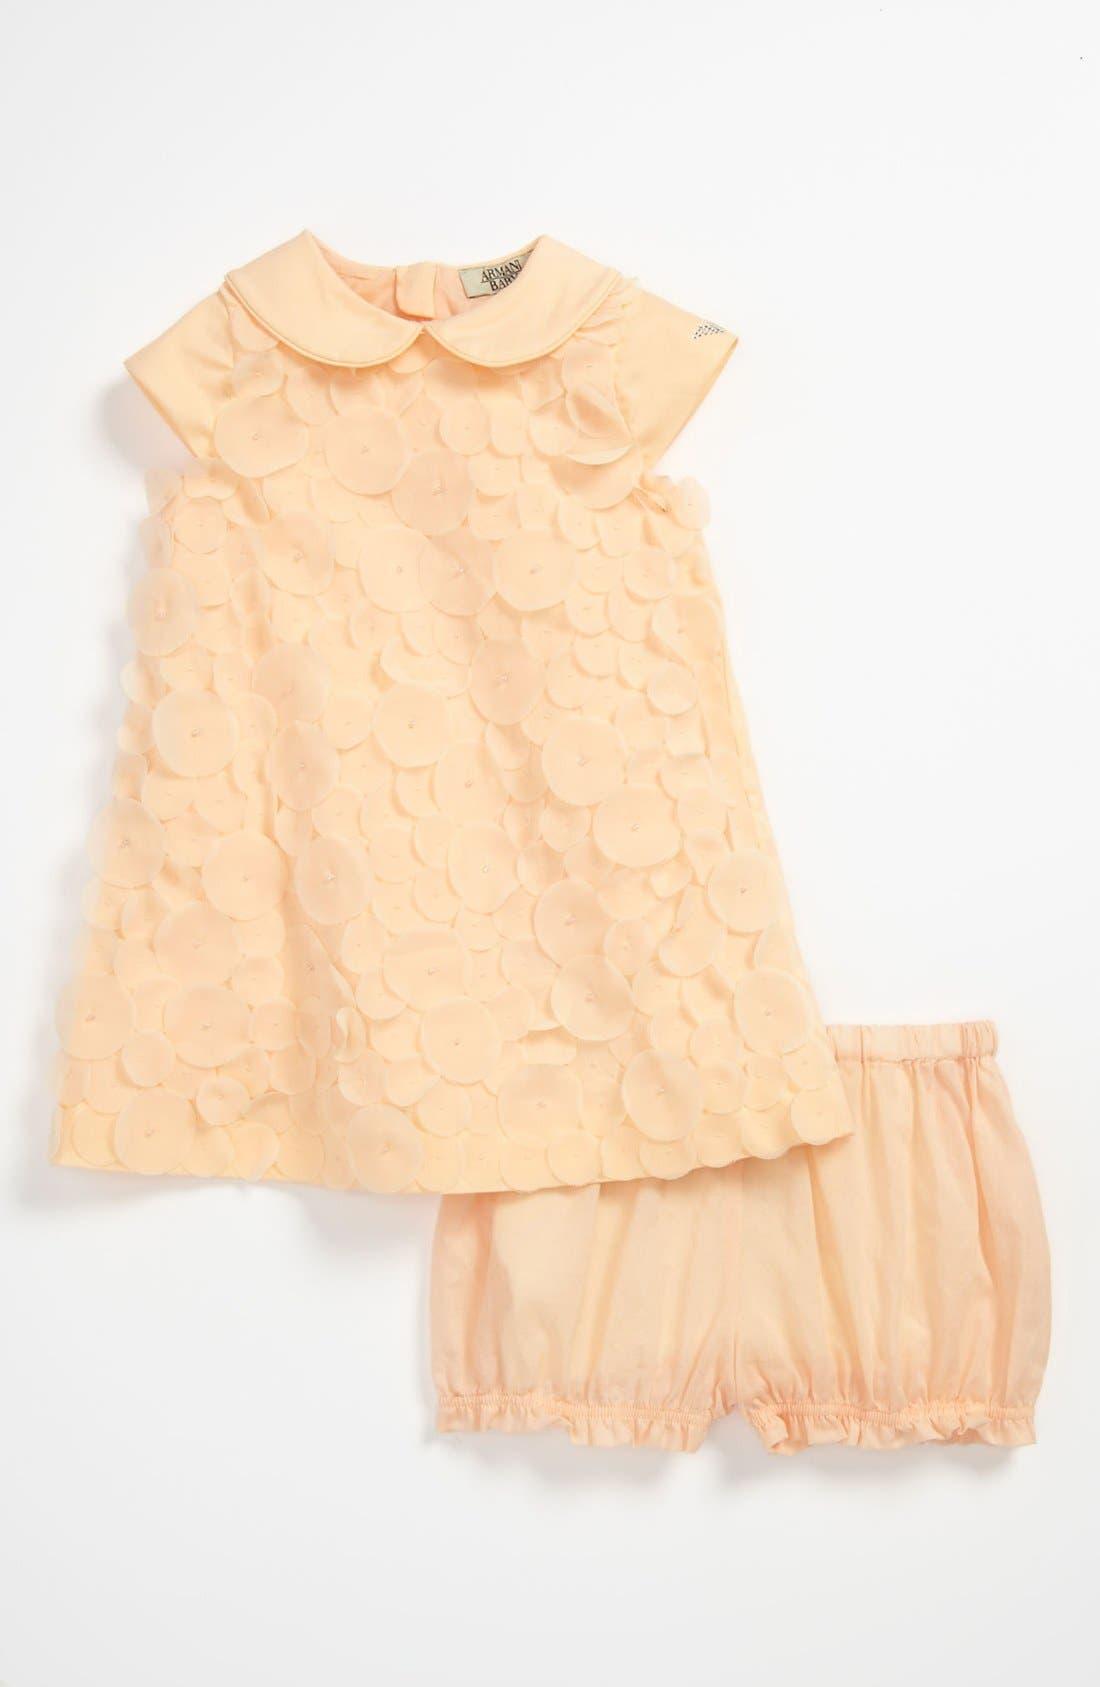 Main Image - Armani Junior 'Disc' Dress & Bloomers (Baby)